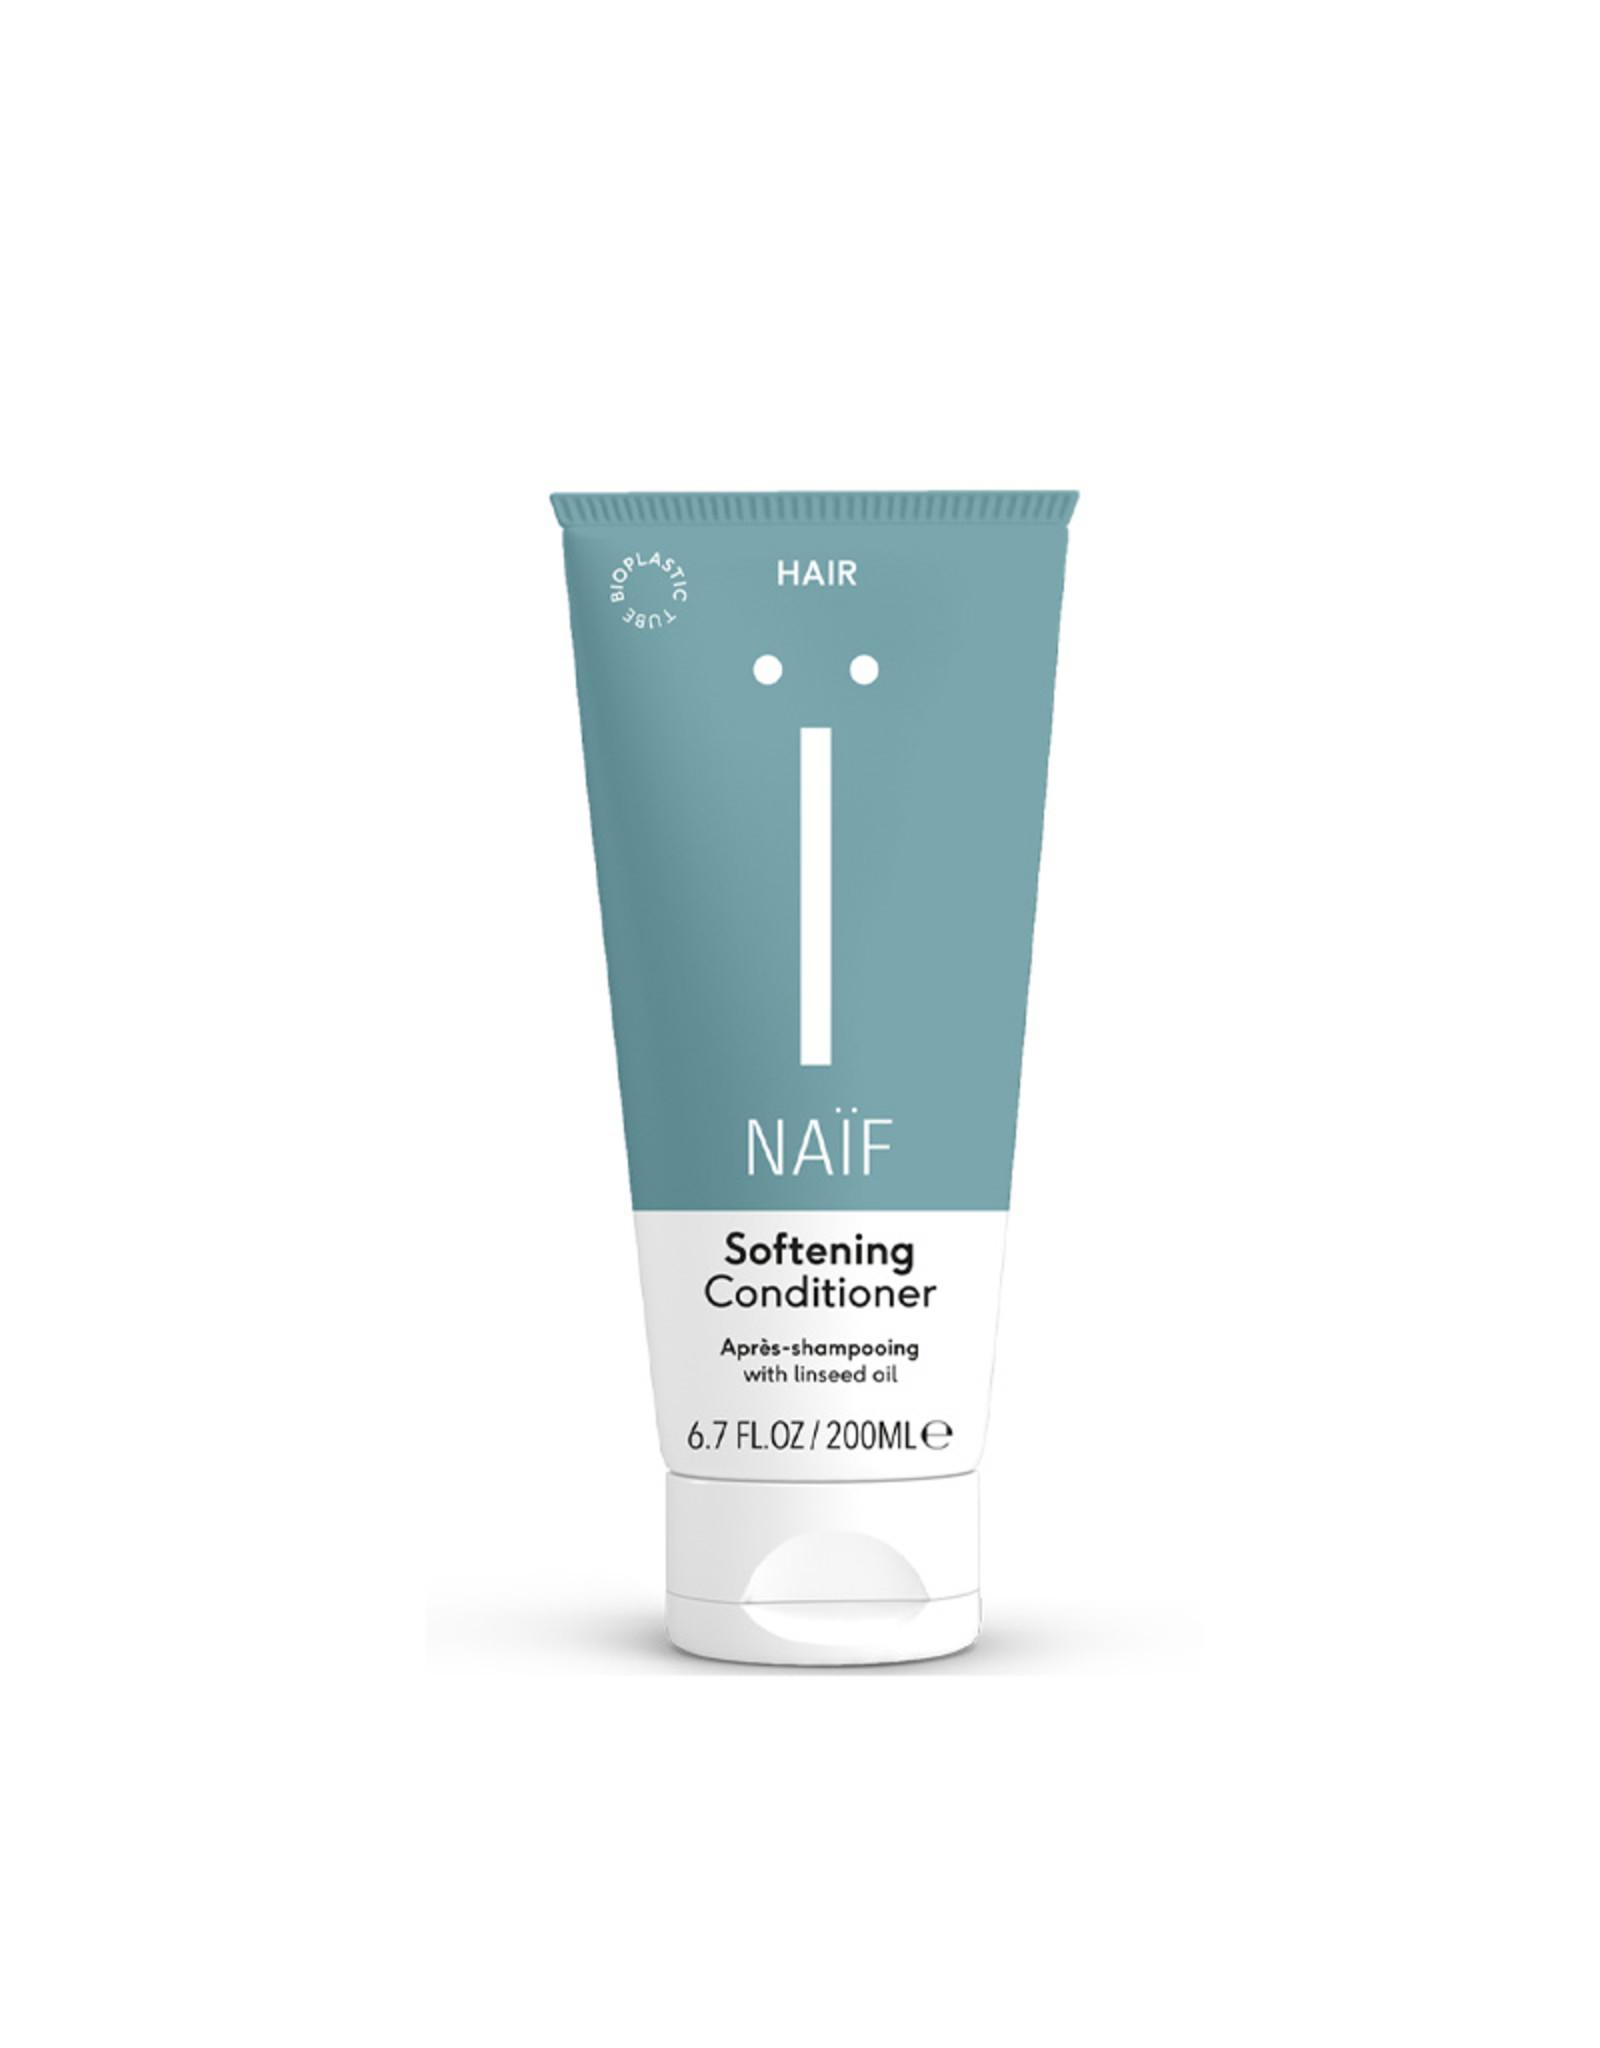 Naïf Softening Conditioner - 200ml